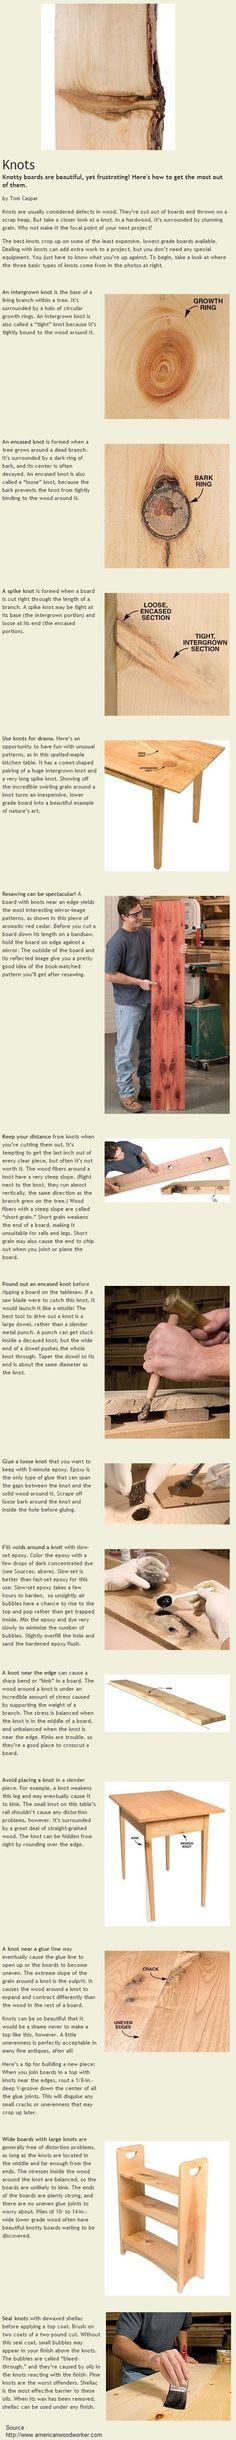 Knots | WoodworkerZ.com